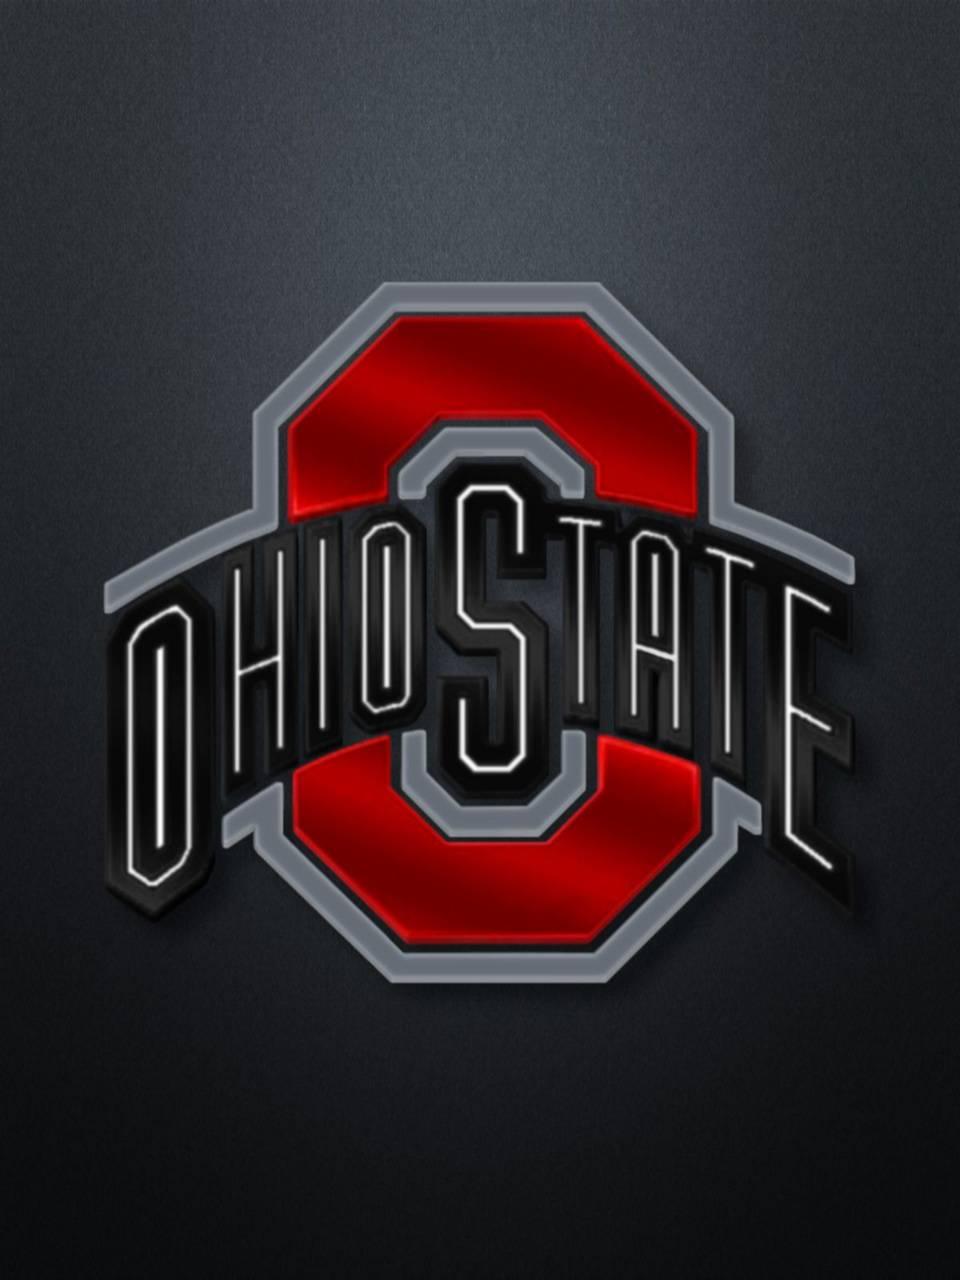 The Ohio State